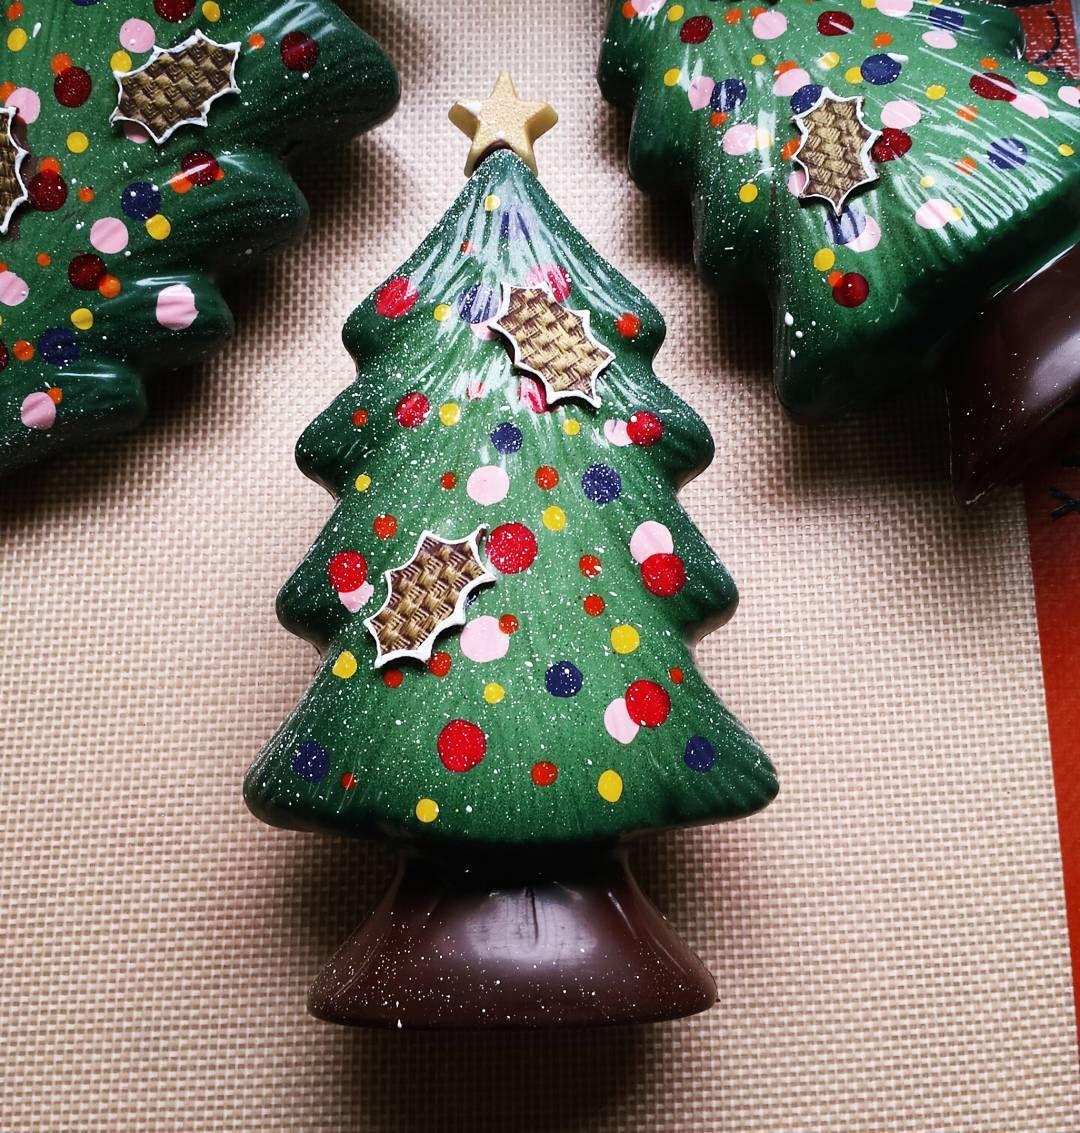 Colorful Christmas trees from EC grad Giorgio Demarini of Roselen ...